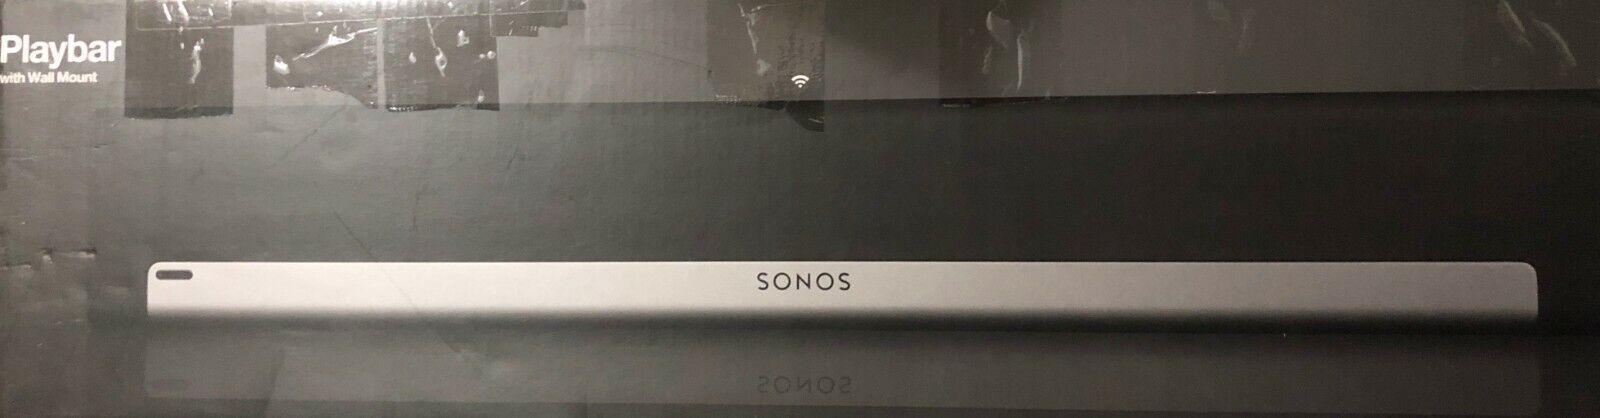 Sonos Playbar TV sound bar wireless music system Bundle with